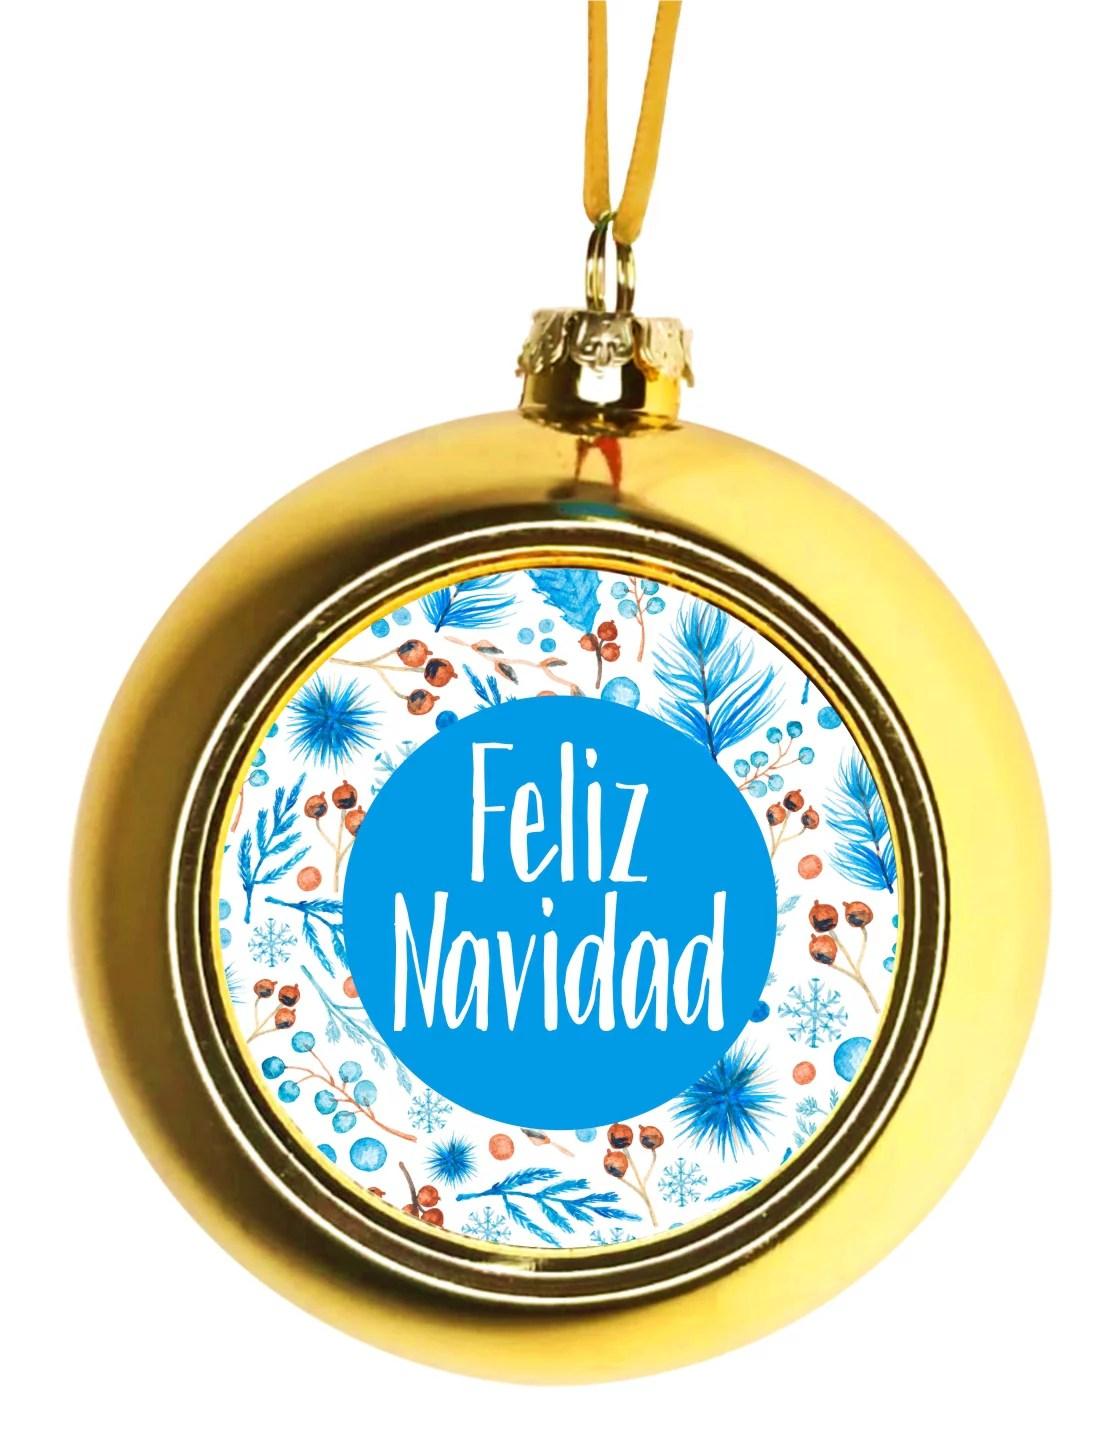 Spanish Feliz Navidad Merry Christmas Hanging Ornament